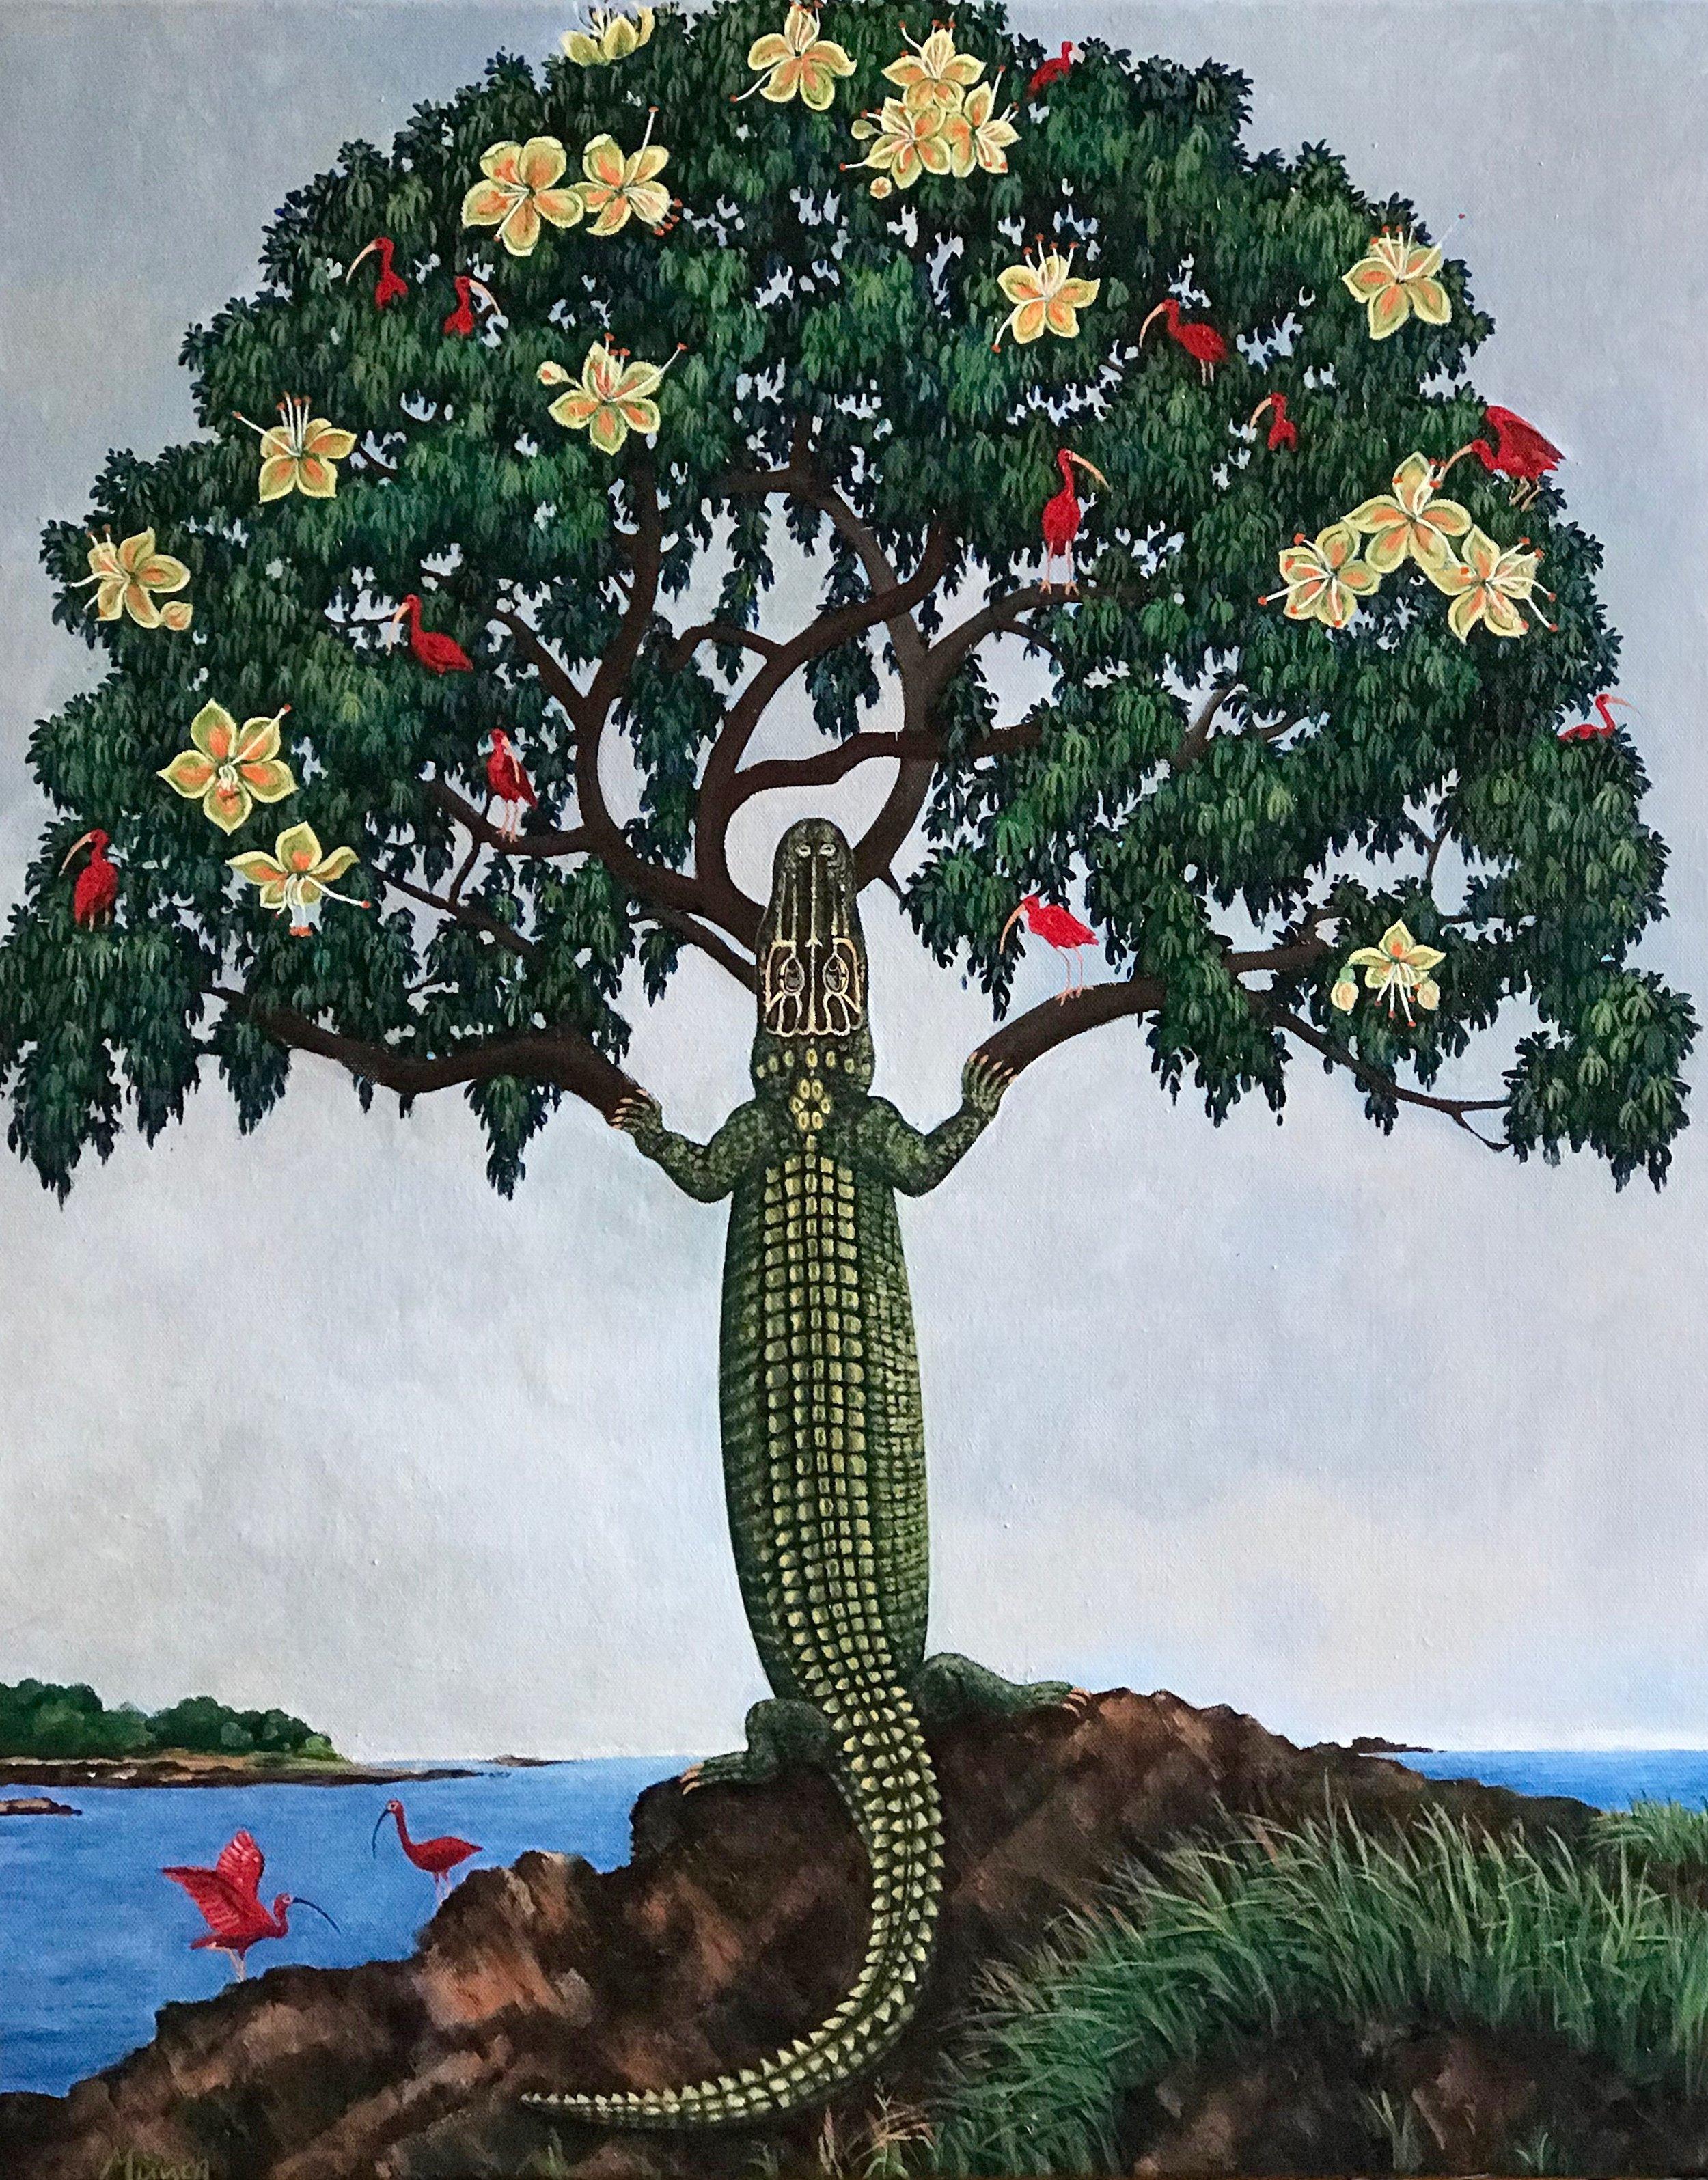 yaxche - Mayan world tree, 24''x30'', acrylic on canvas, 2018